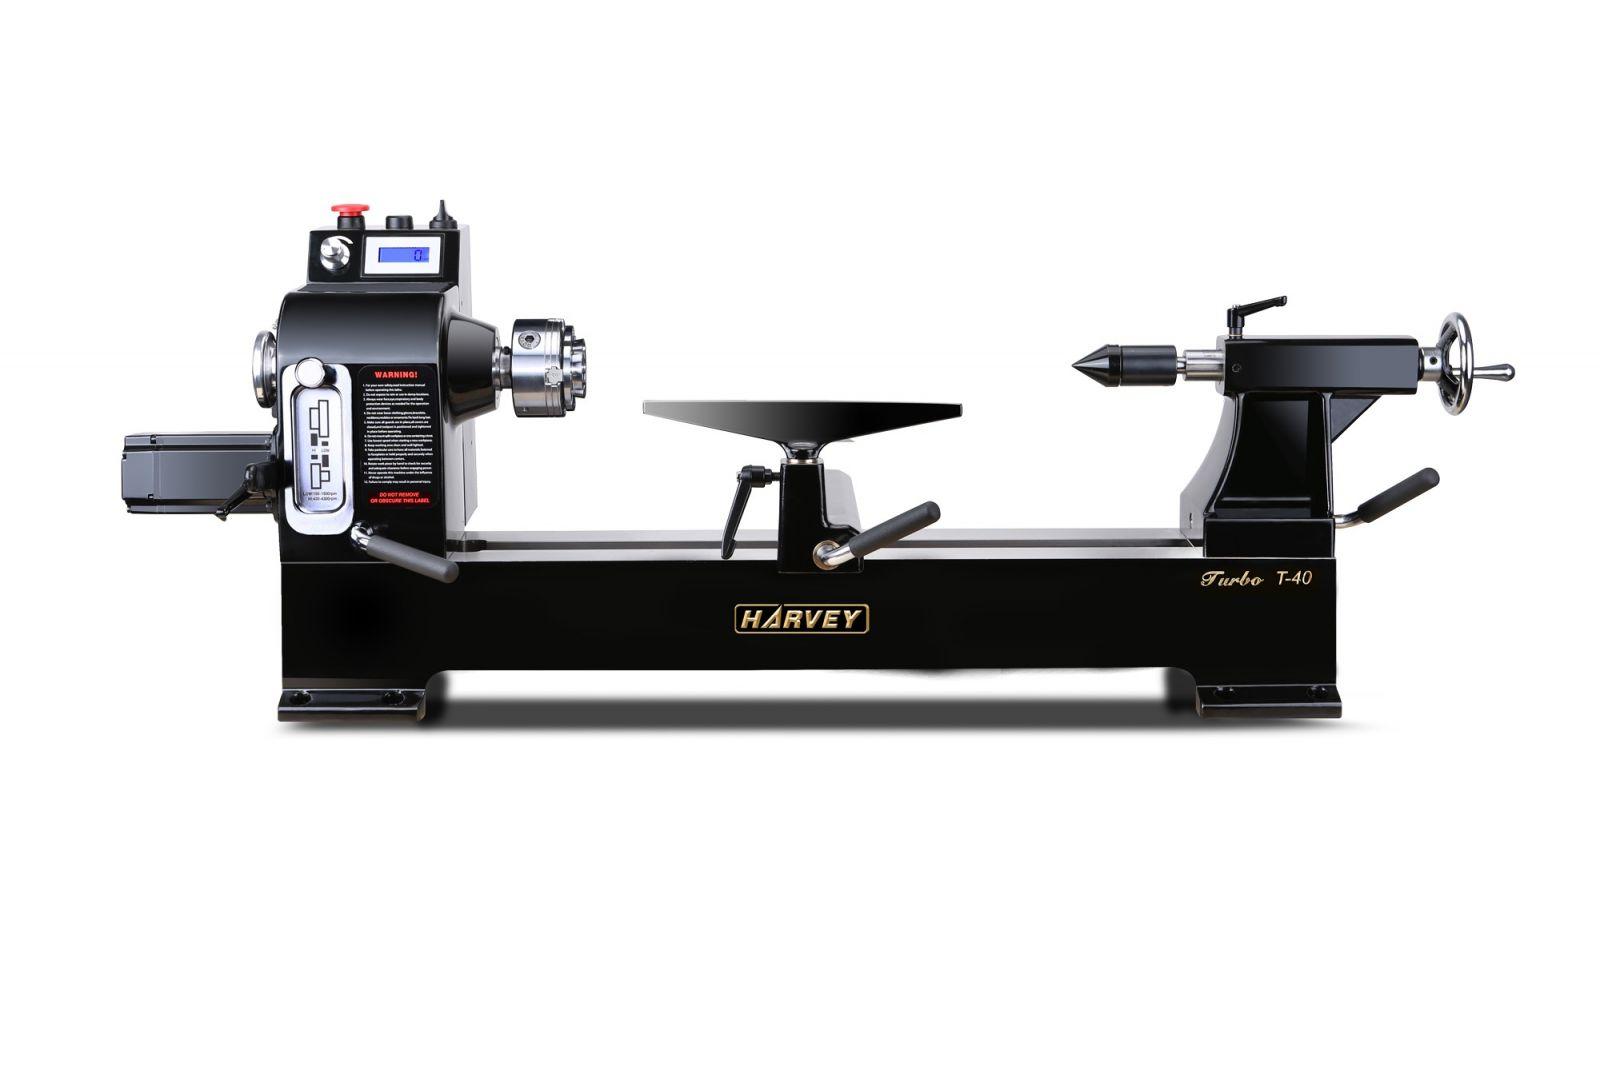 Harvey T-40